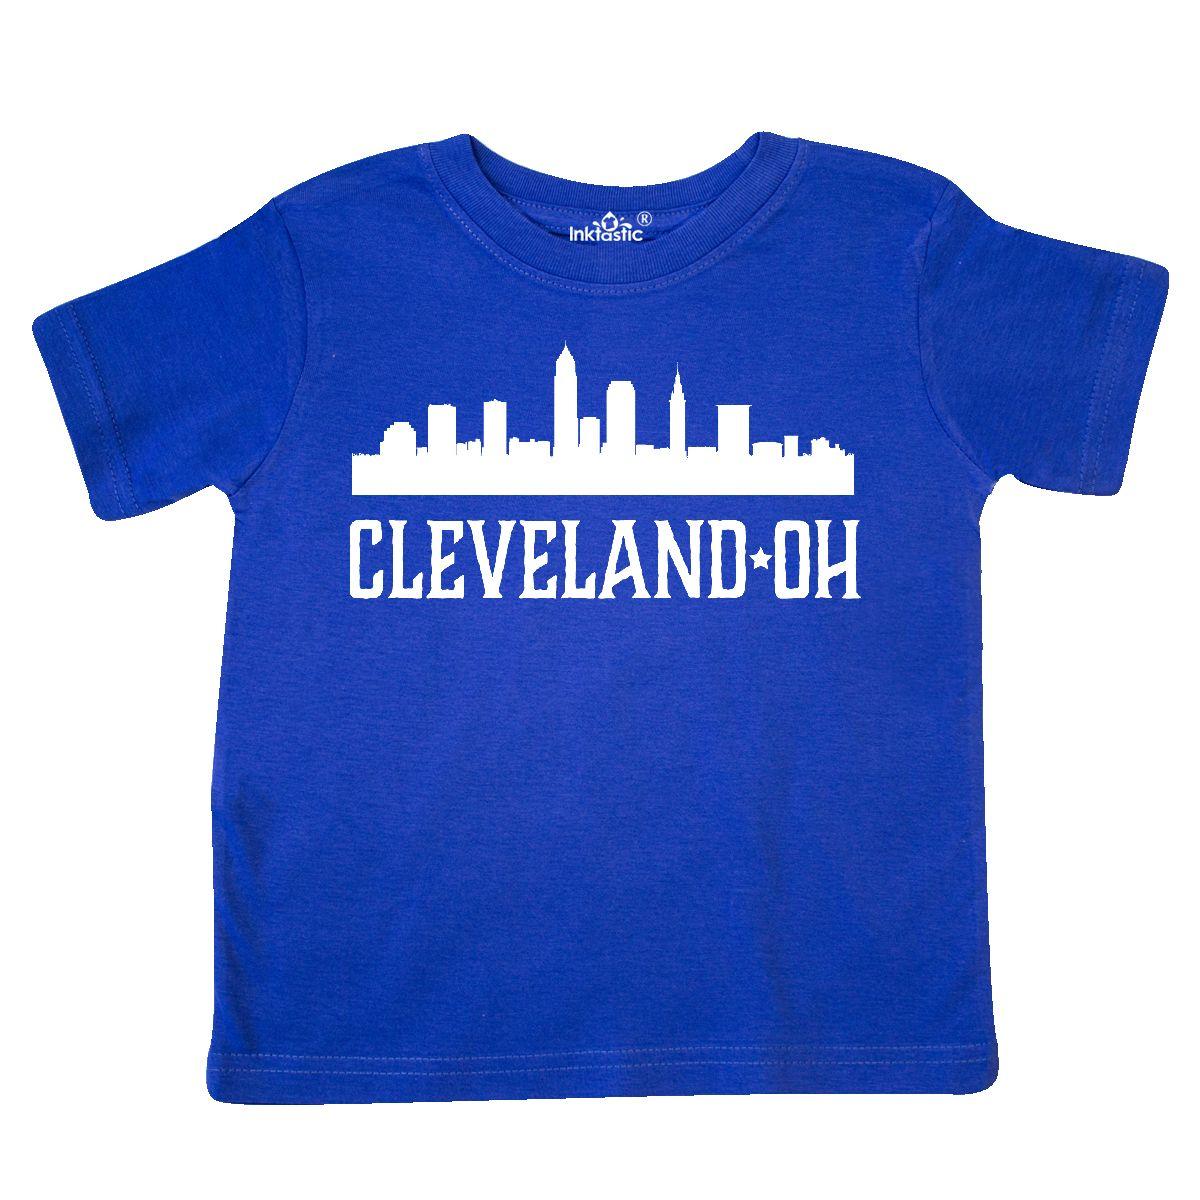 1200x1200 Inktastic Cleveland Ohio Skyline City Silhouette Toddler T Shirt